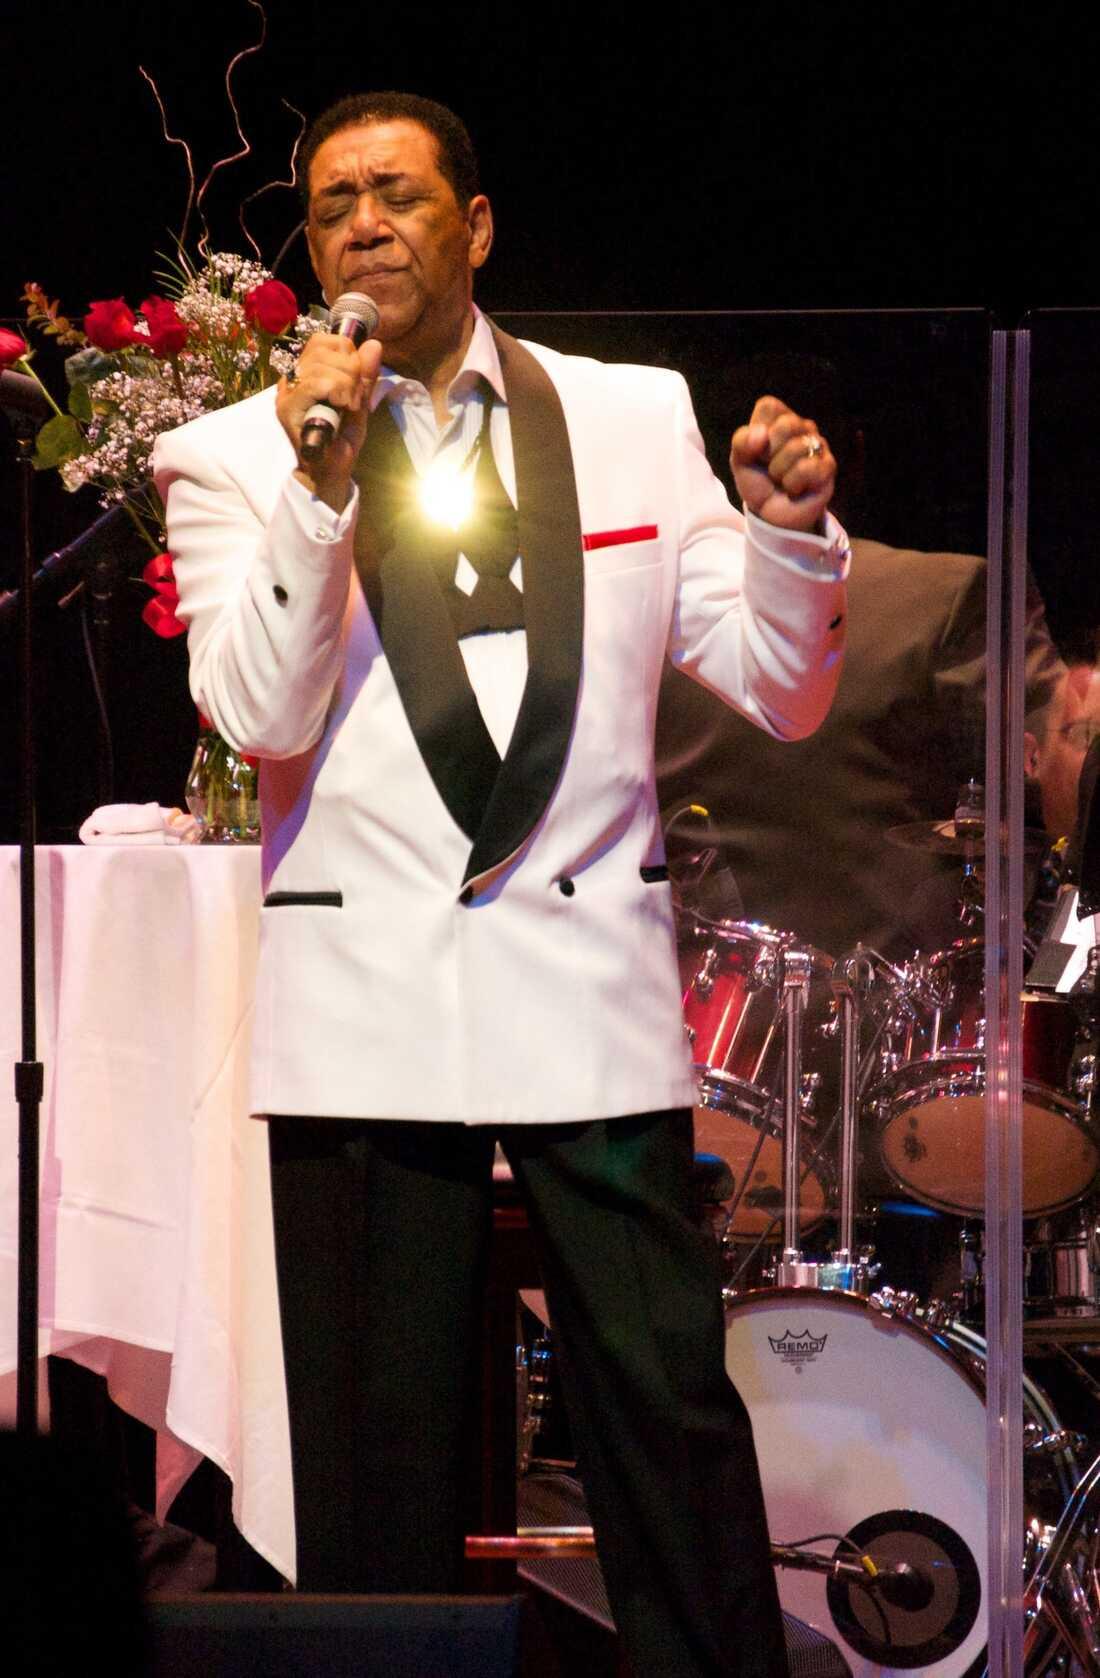 The Flamingos Bethesda Blues & Jazz Supper Club Bethesda, MD Photo by Bob Boilen for NPR Music